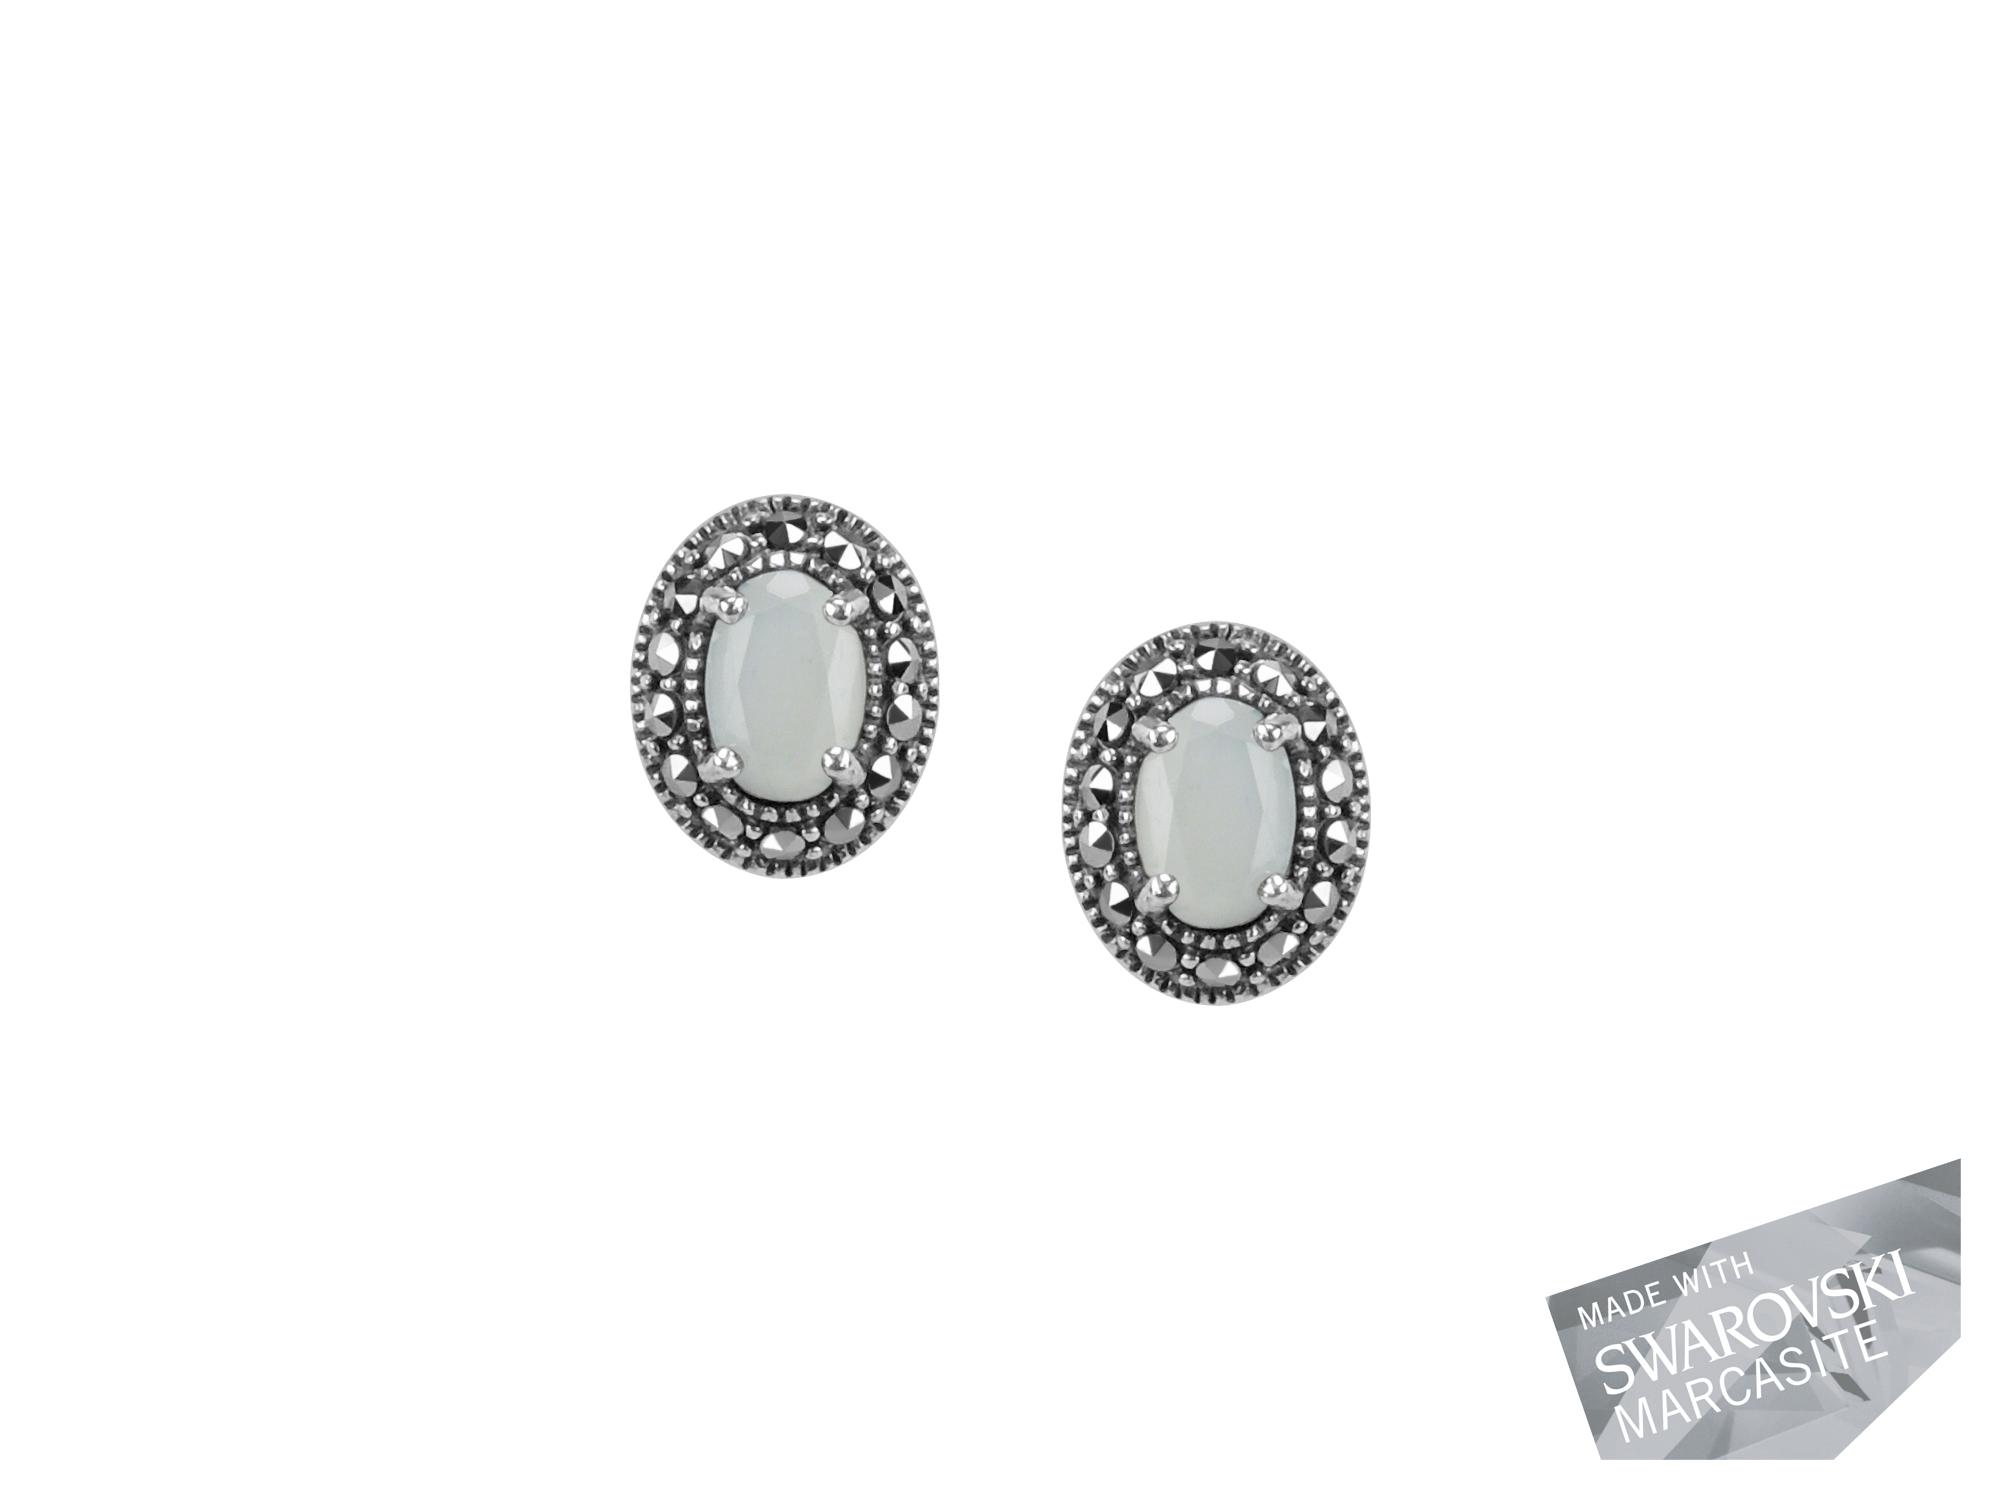 Moonstone Stud Earrings MJ18961